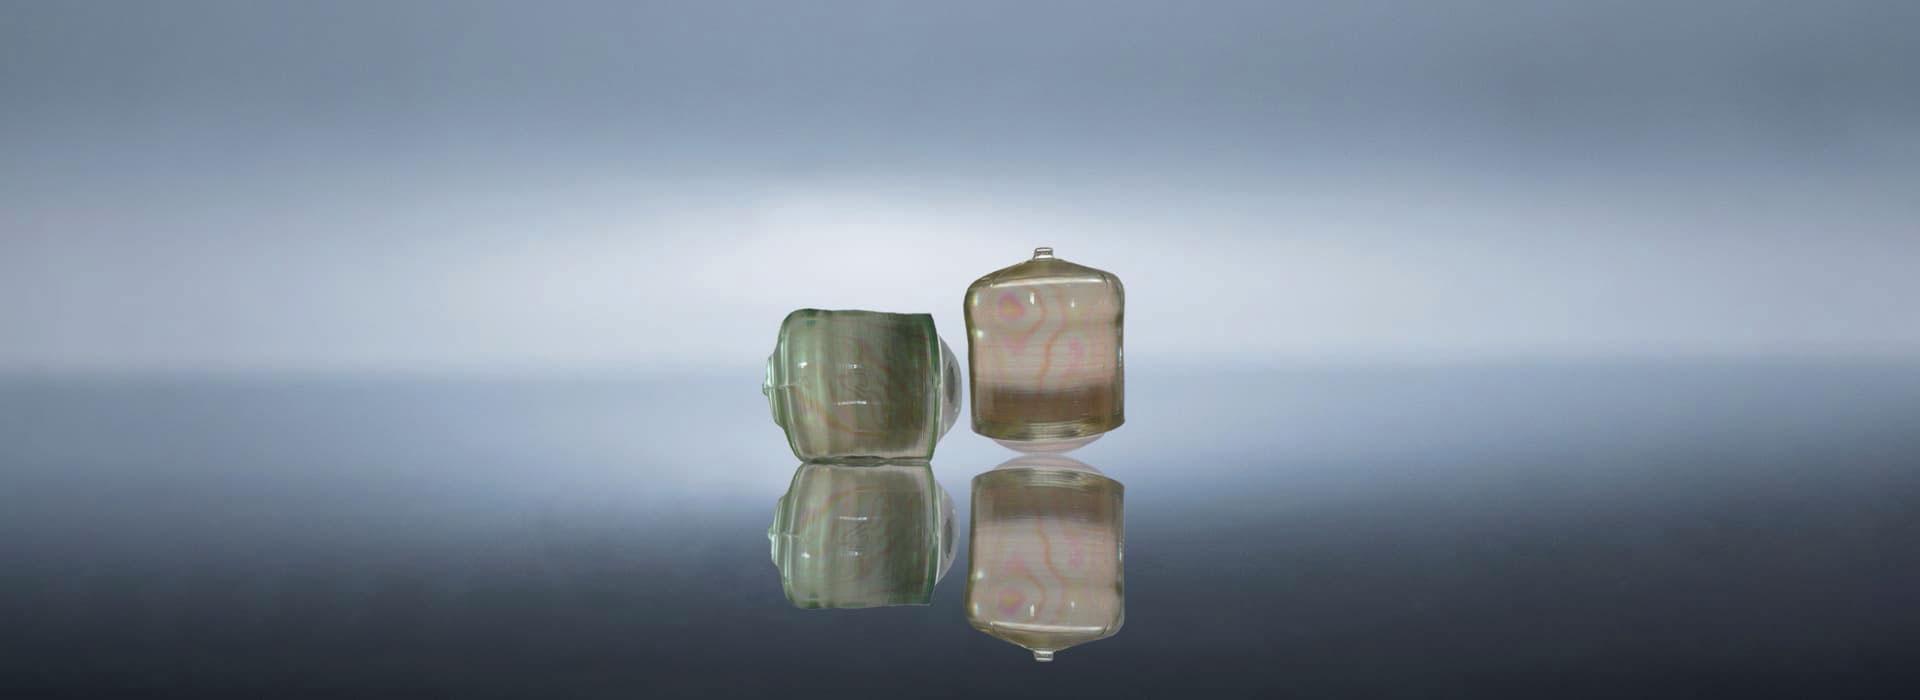 linbo3-铌酸锂晶体-南京光宝-CRYLINK